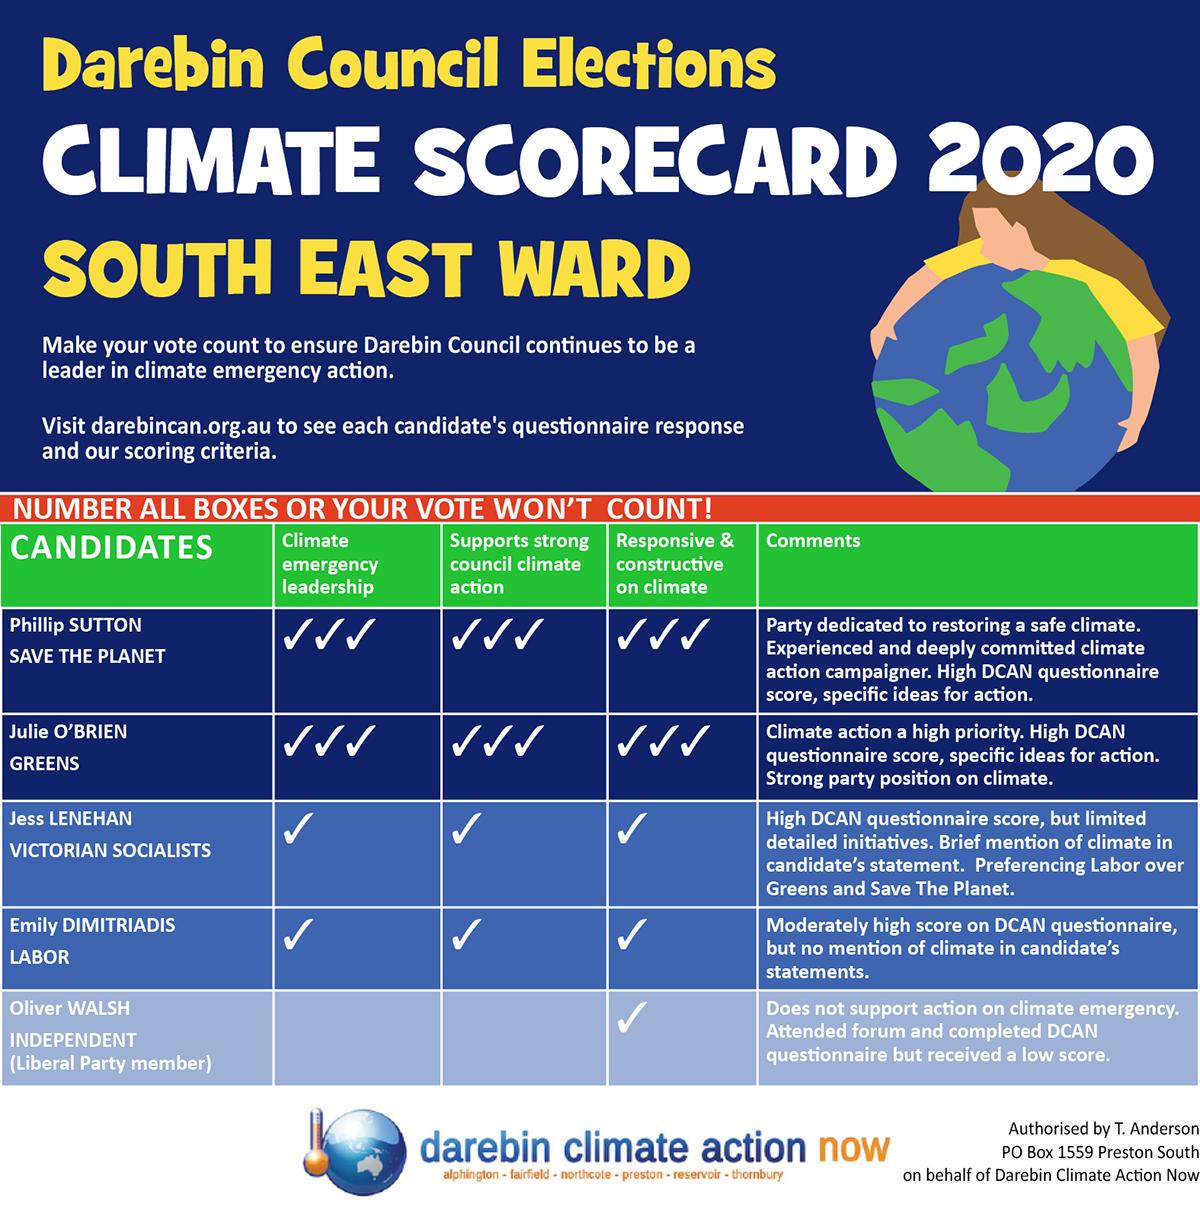 South East Ward scorecard